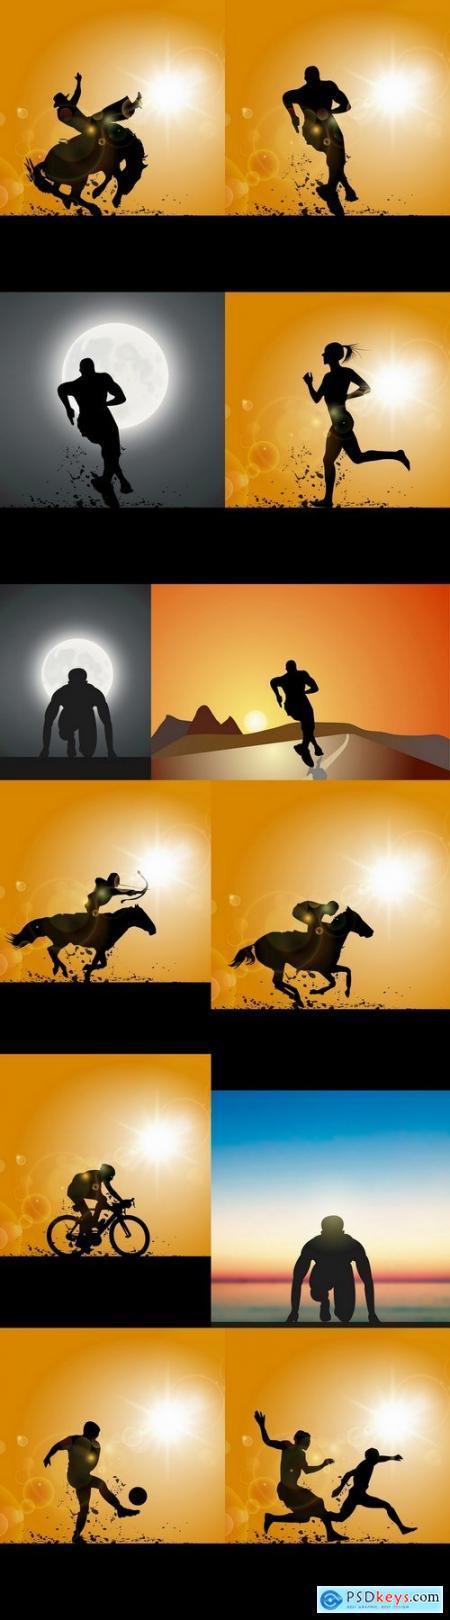 Sport football running horse racing 12 EPS